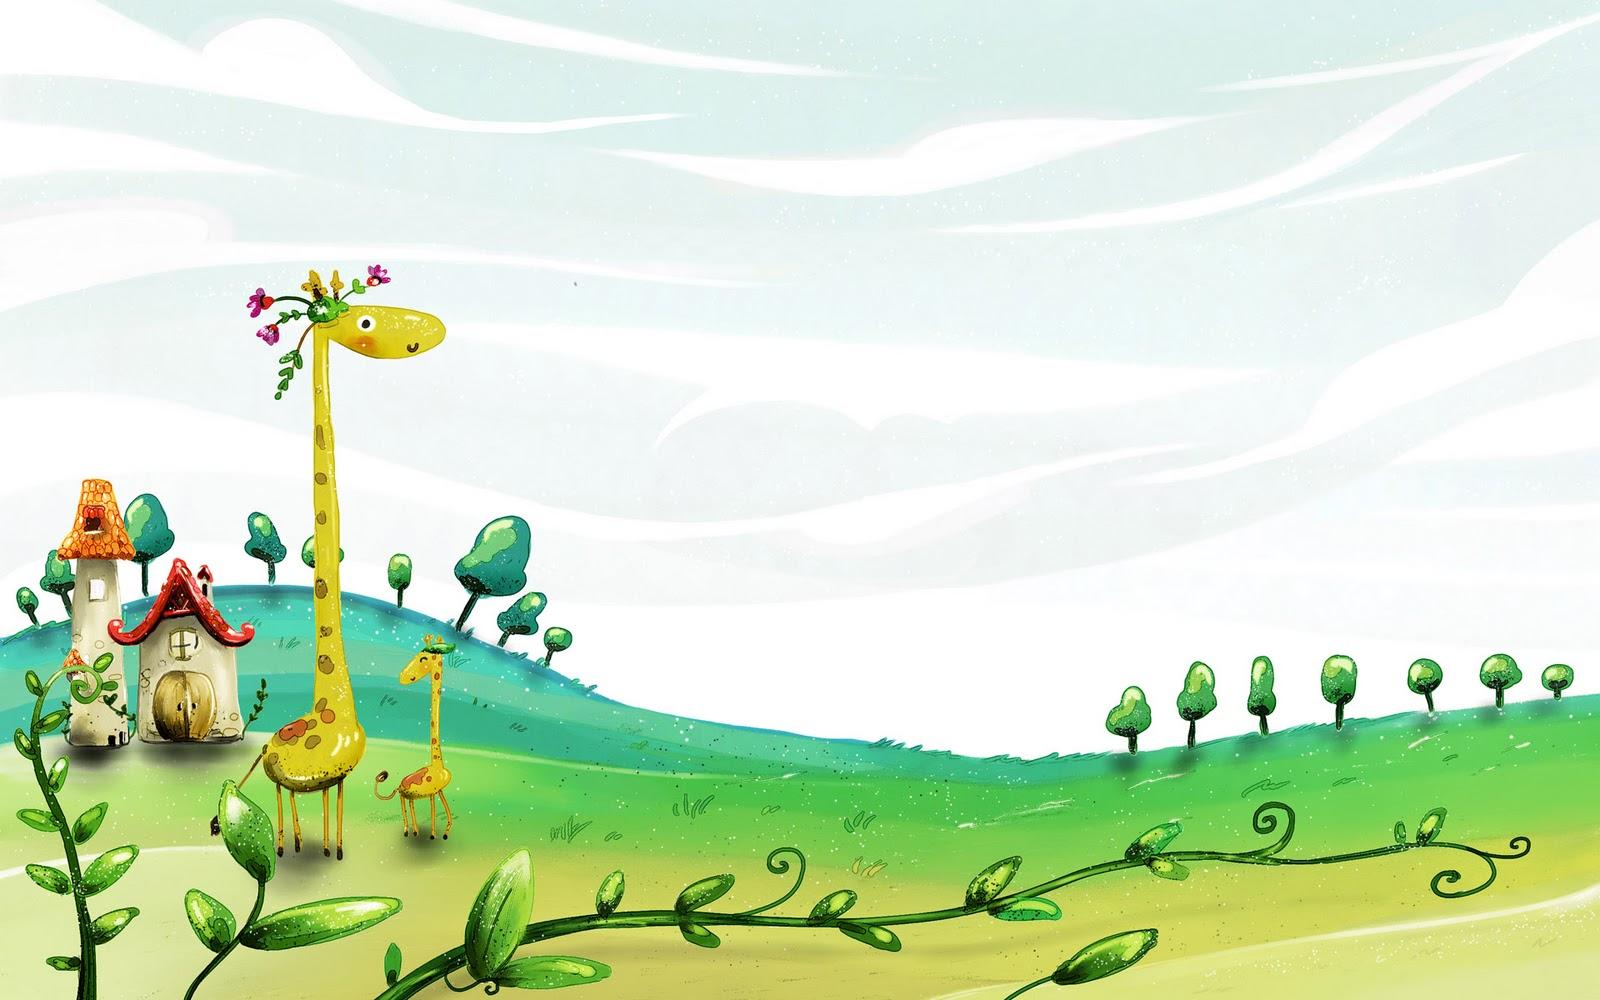 blink 182 cartoon wallpaper free download cartoon pictures cartoons wallpapers - Free Cartoon Download For Kids